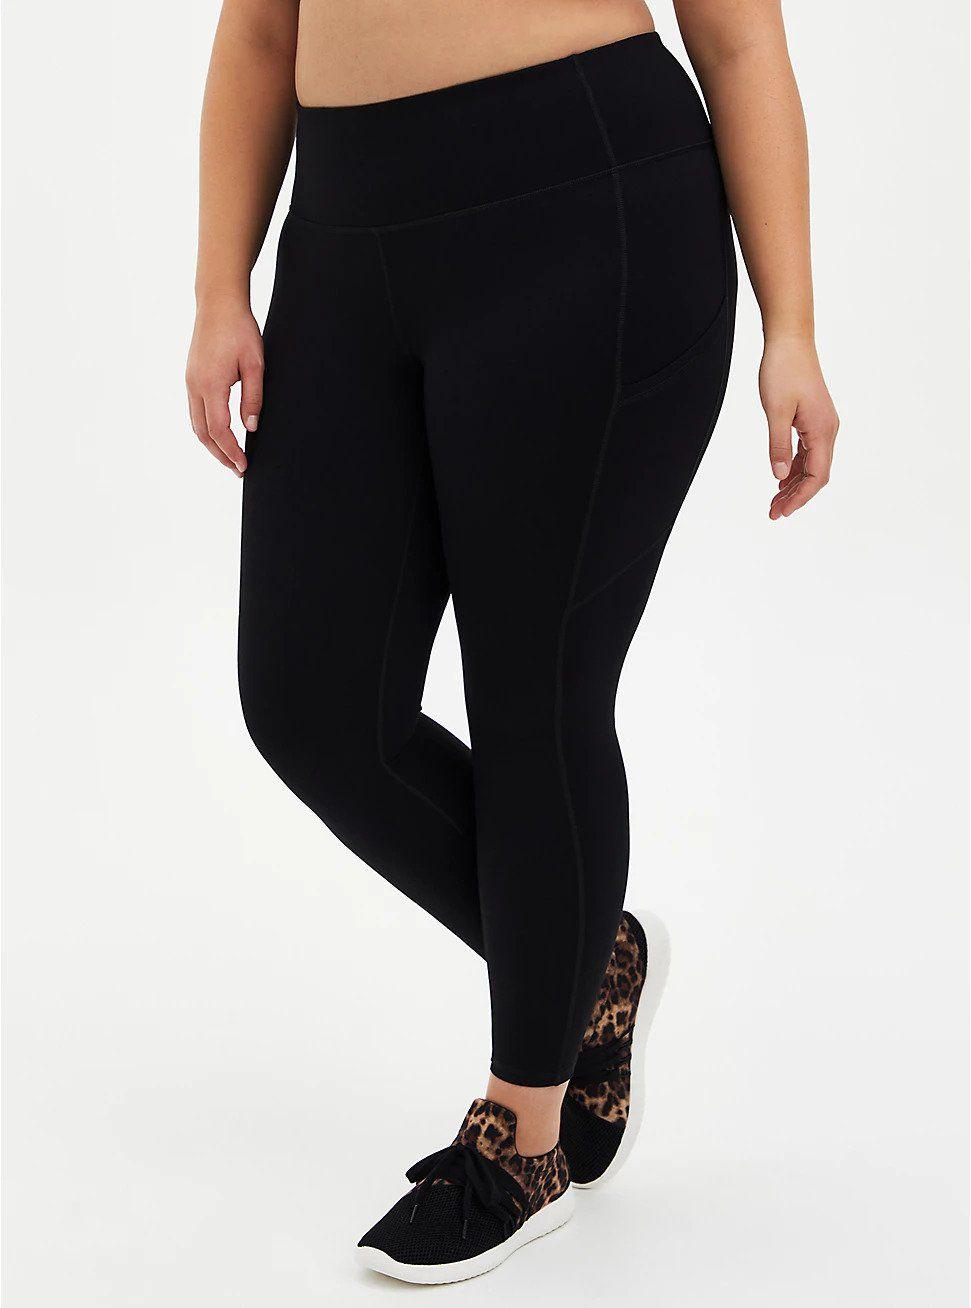 Torrid Black Wicking Full Length Active Legging with Pockets